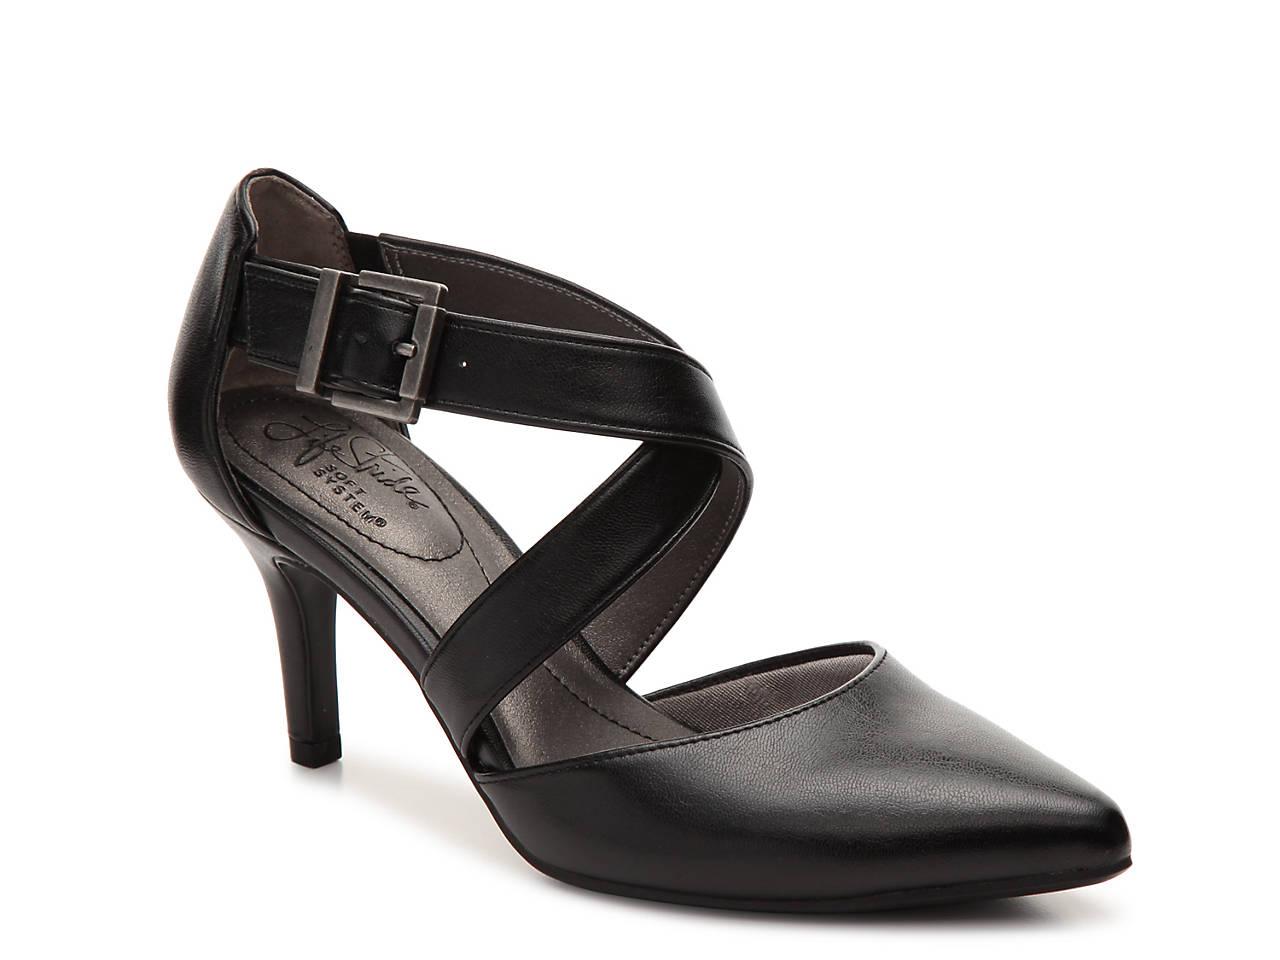 0fcf3b7cb02 LifeStride See This Pump Women s Shoes